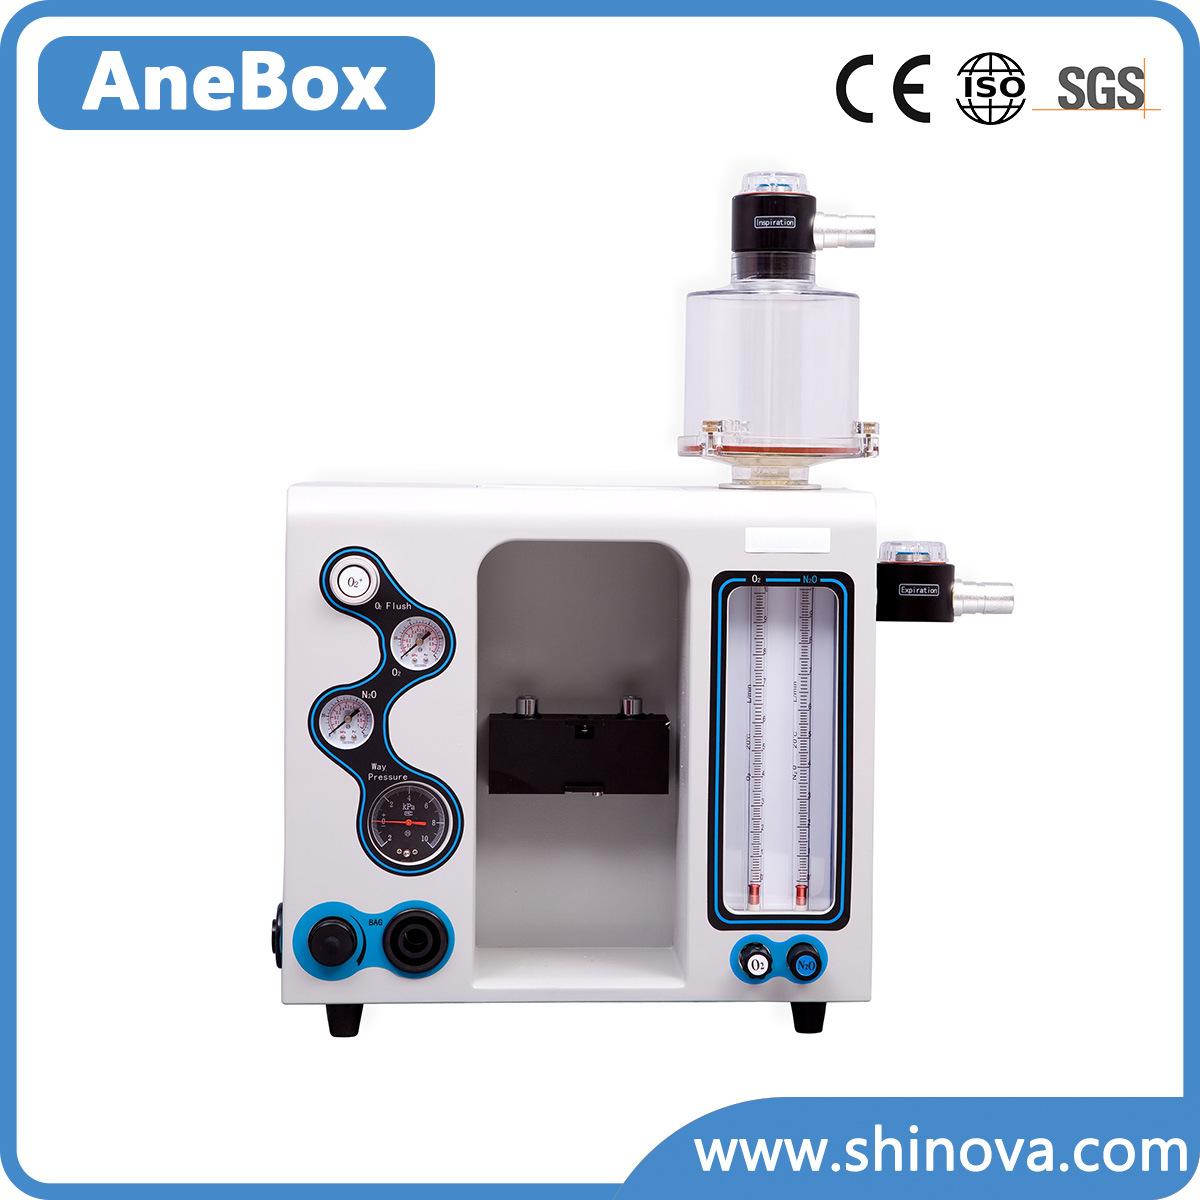 Portable Anesthesia Machine (AneBox)